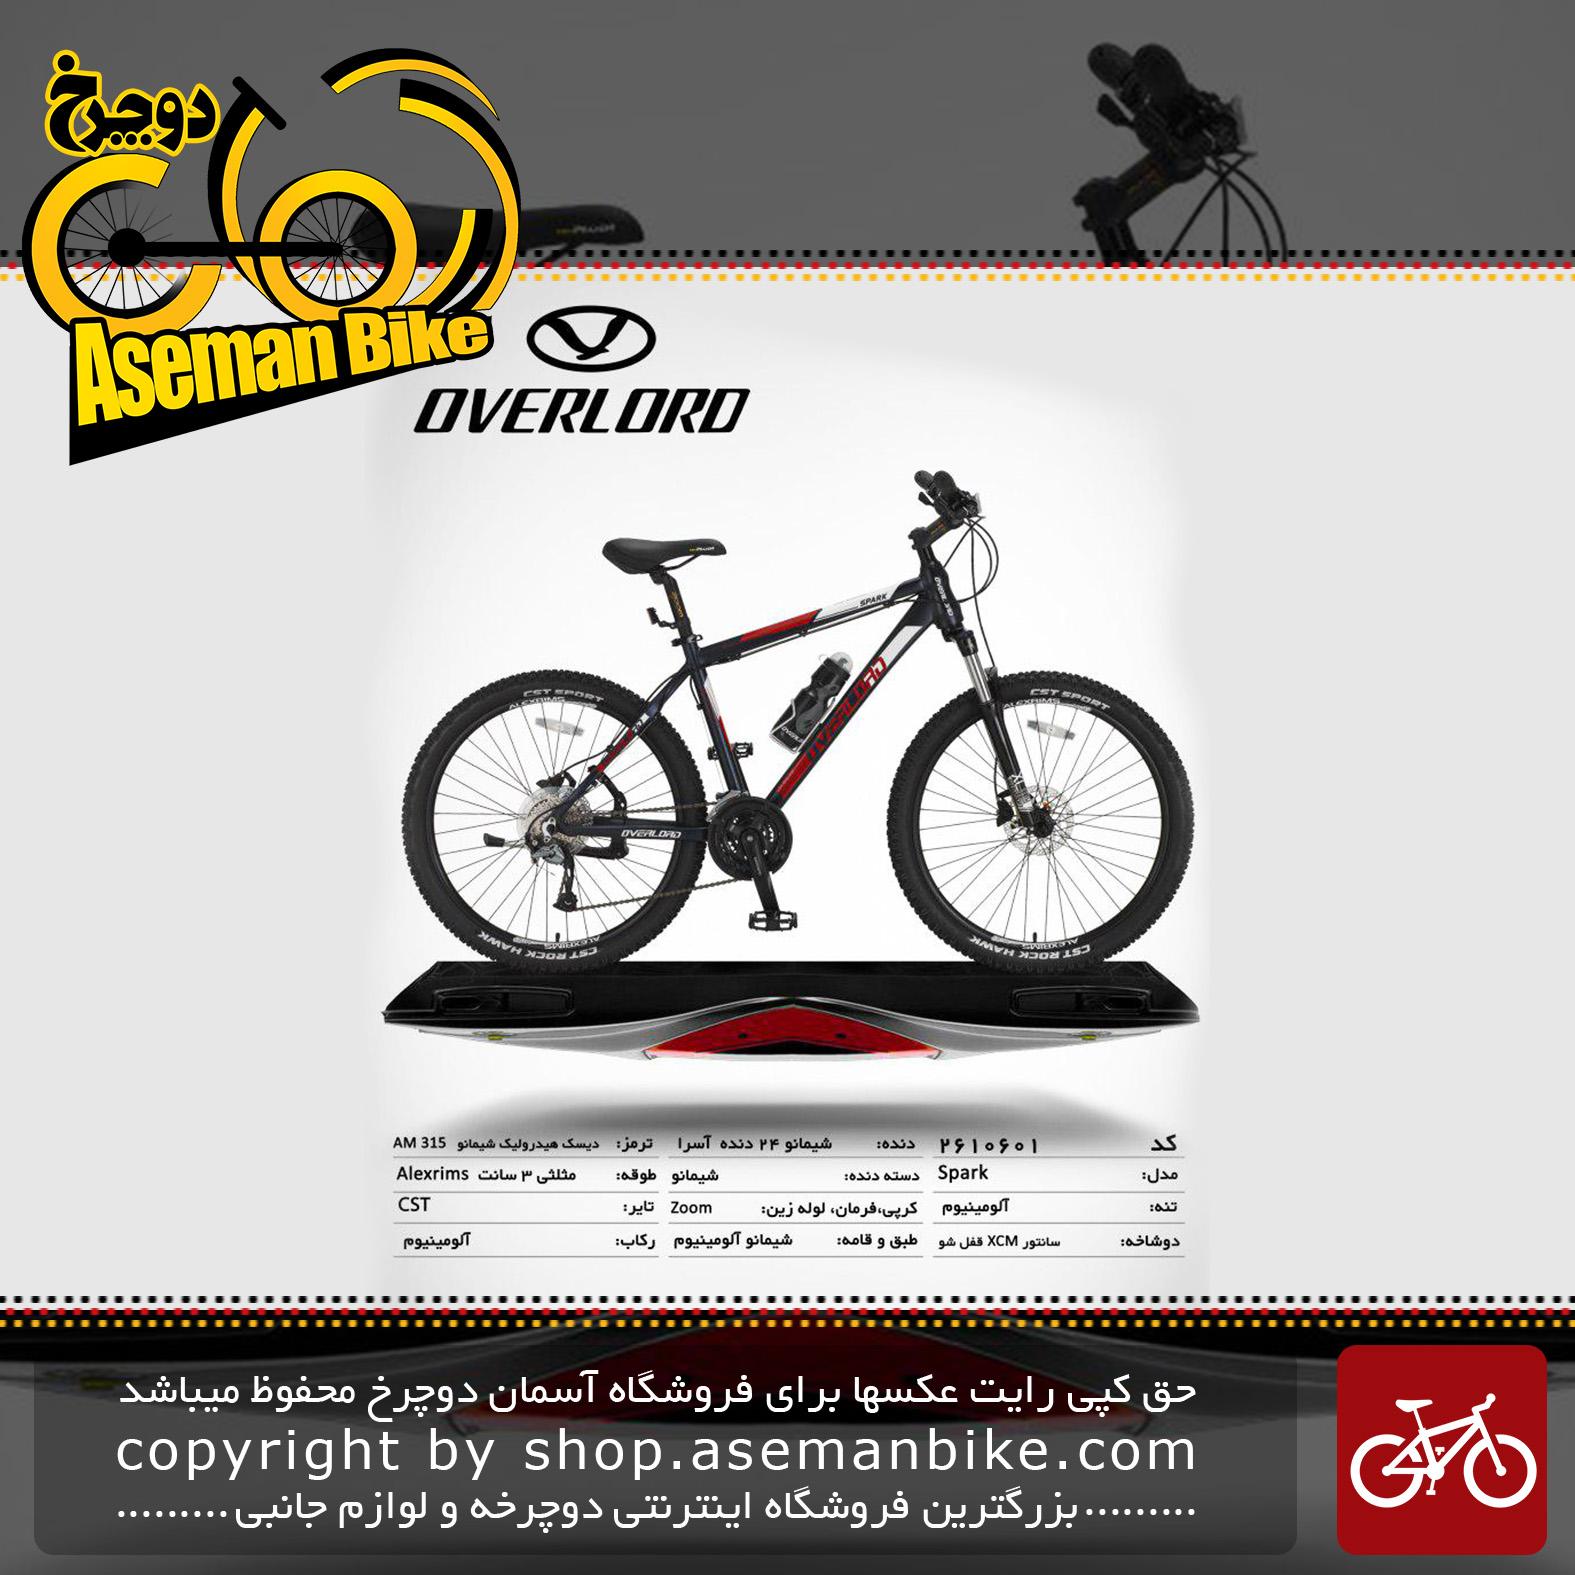 دوچرخه کوهستان شهری اورلرد مدل اسپارک 24 دنده شیمانو آسرا سایز 26 ساخت تایوان OVERLORD Mountain City Taiwan Bicycle SPARK 27.5 2019